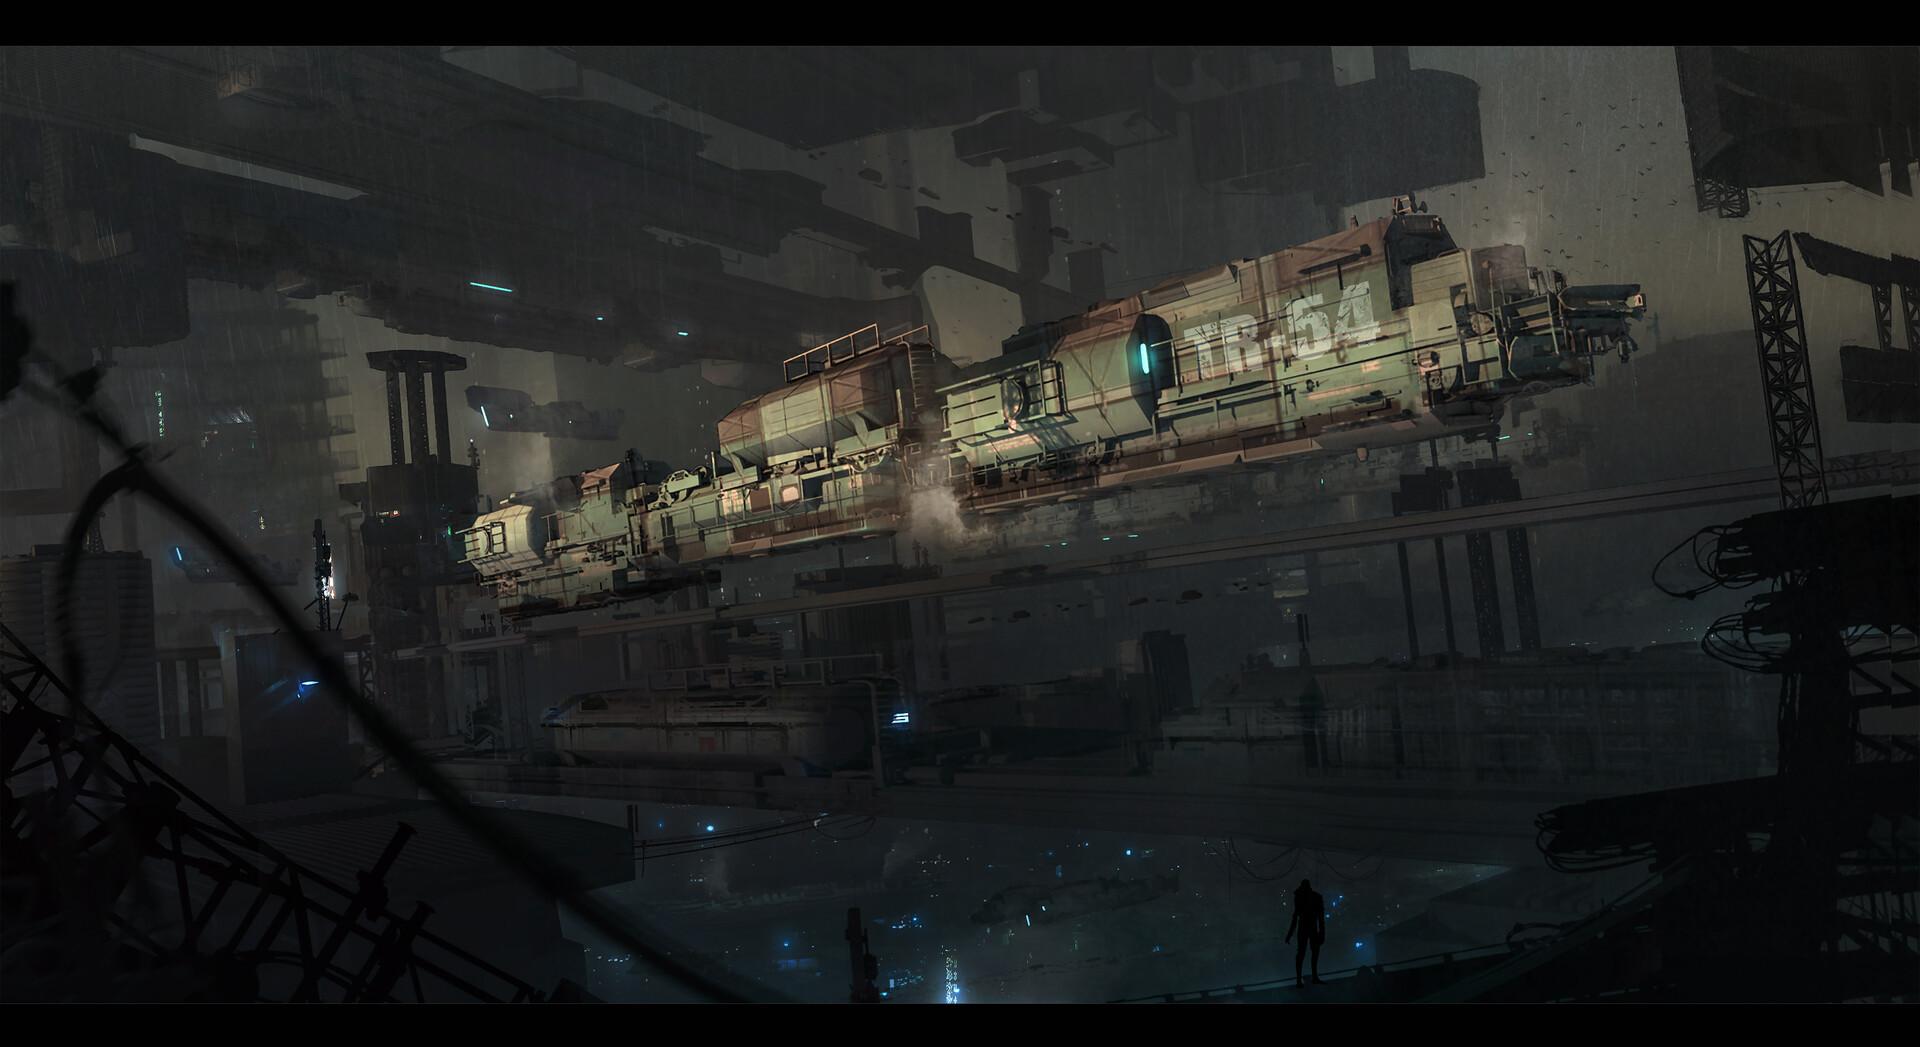 Julian calle sci fi stationa